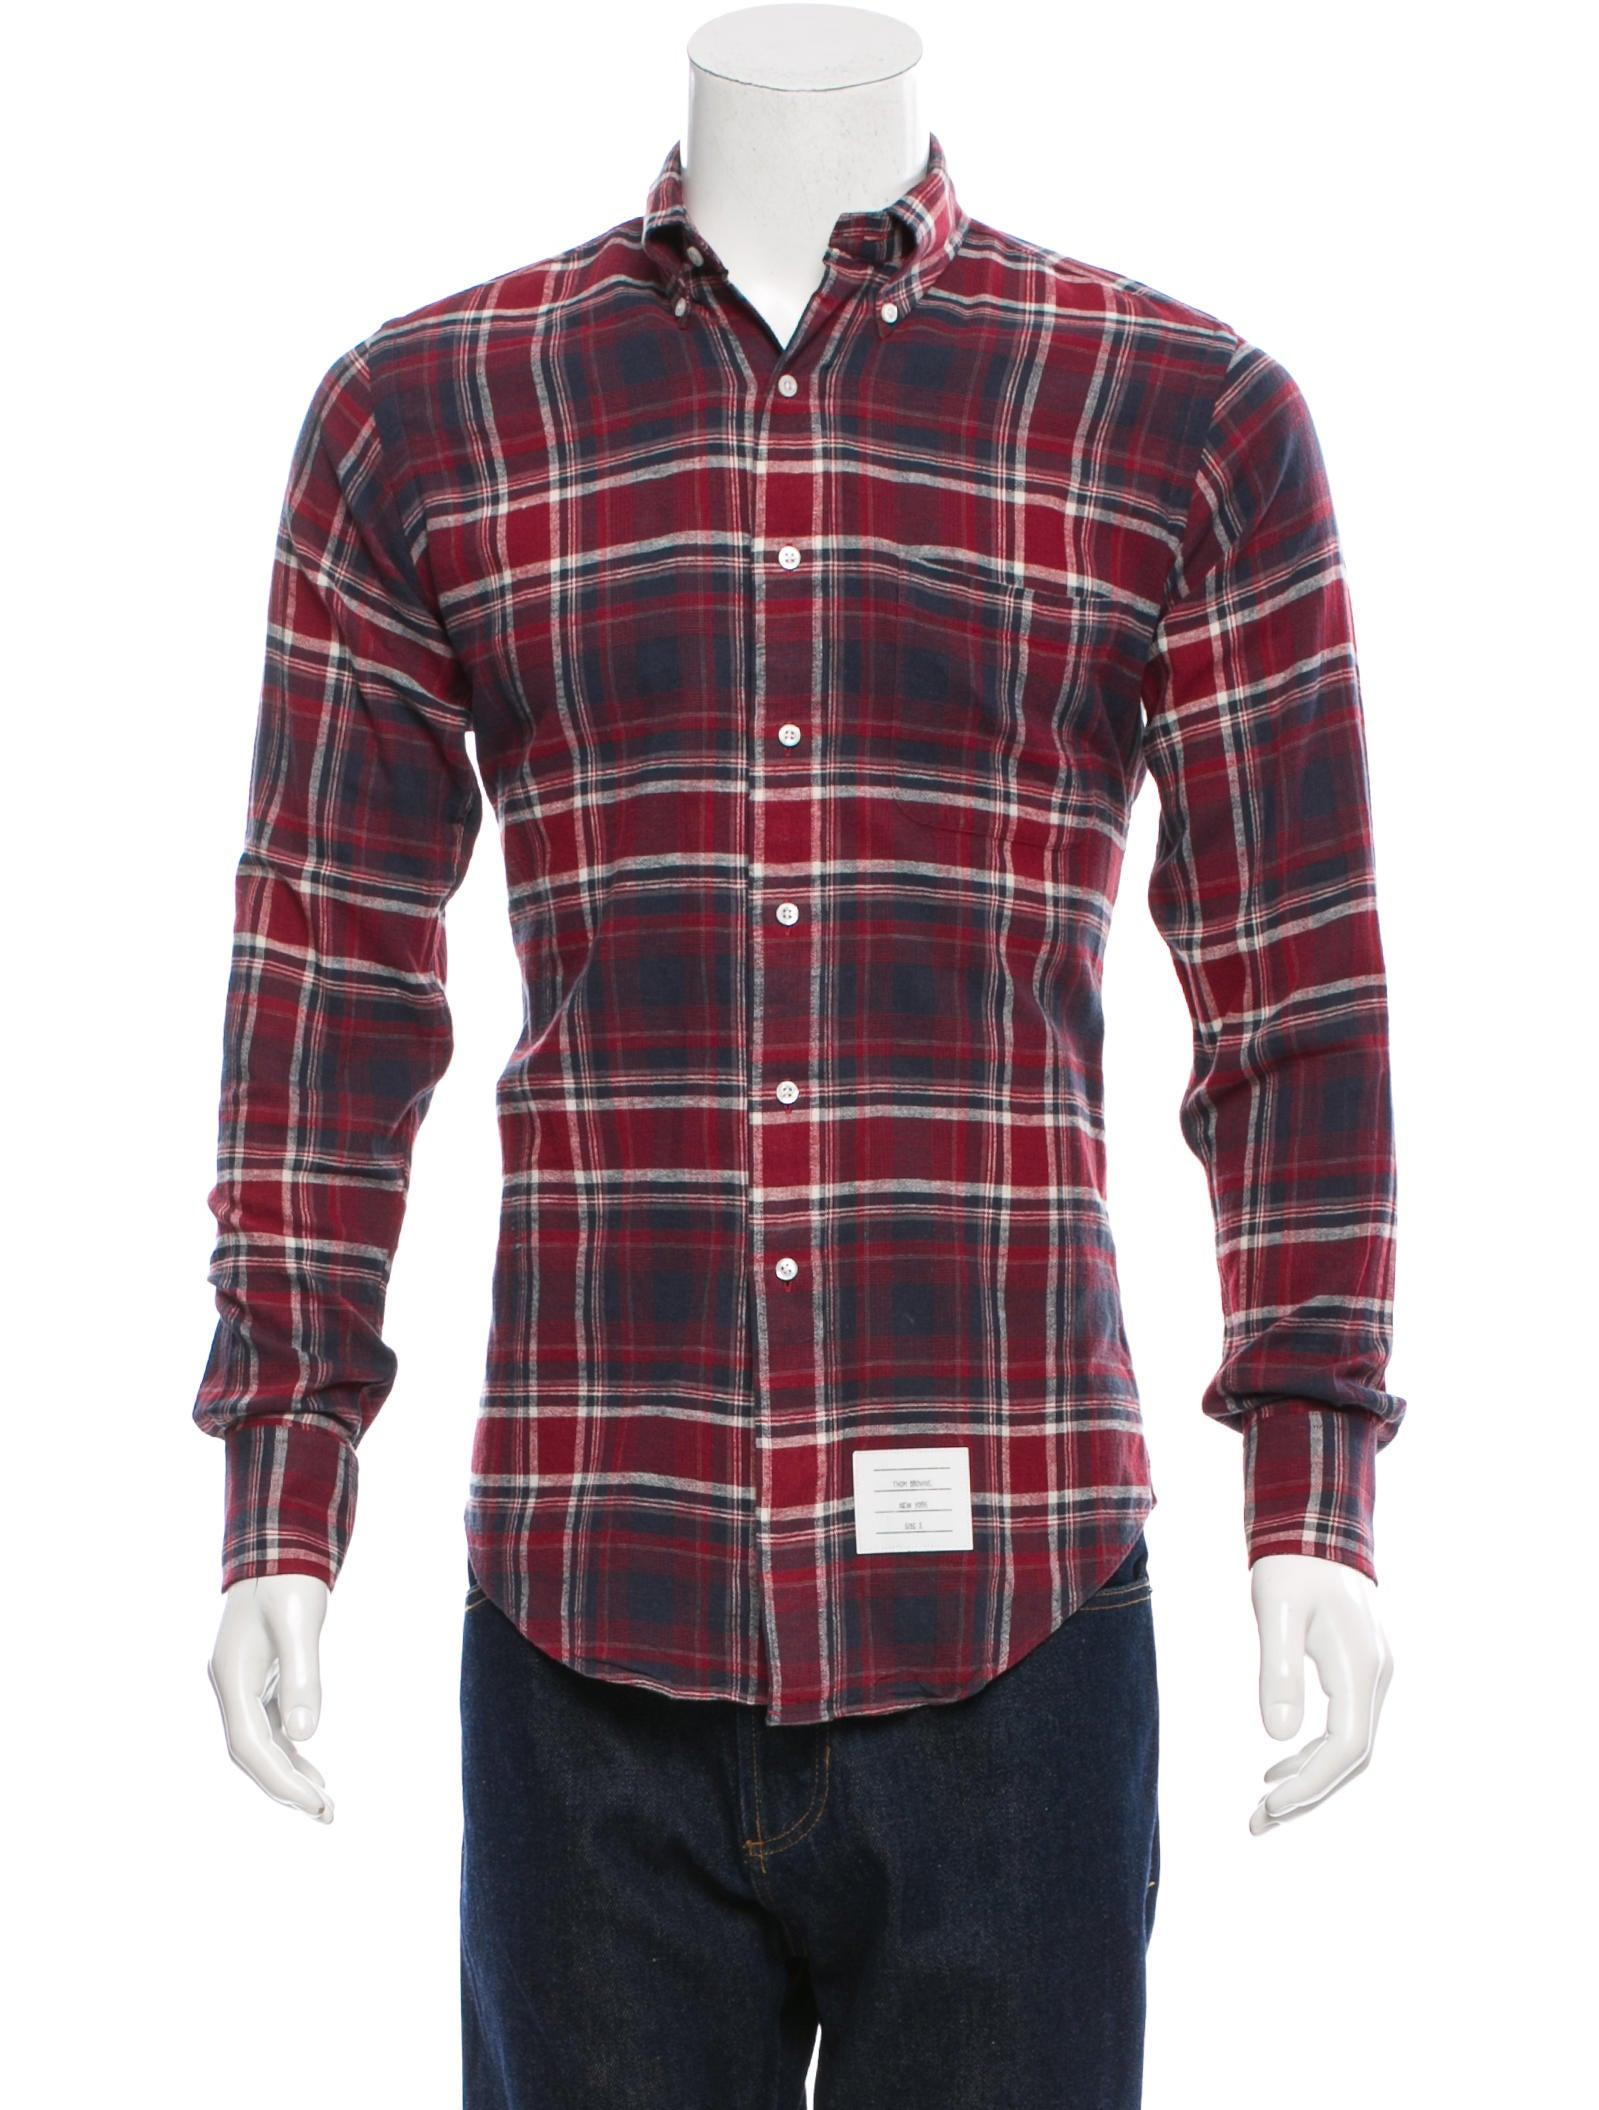 Thom browne plaid button up shirt clothing tho21226 for Thom browne shirt sale